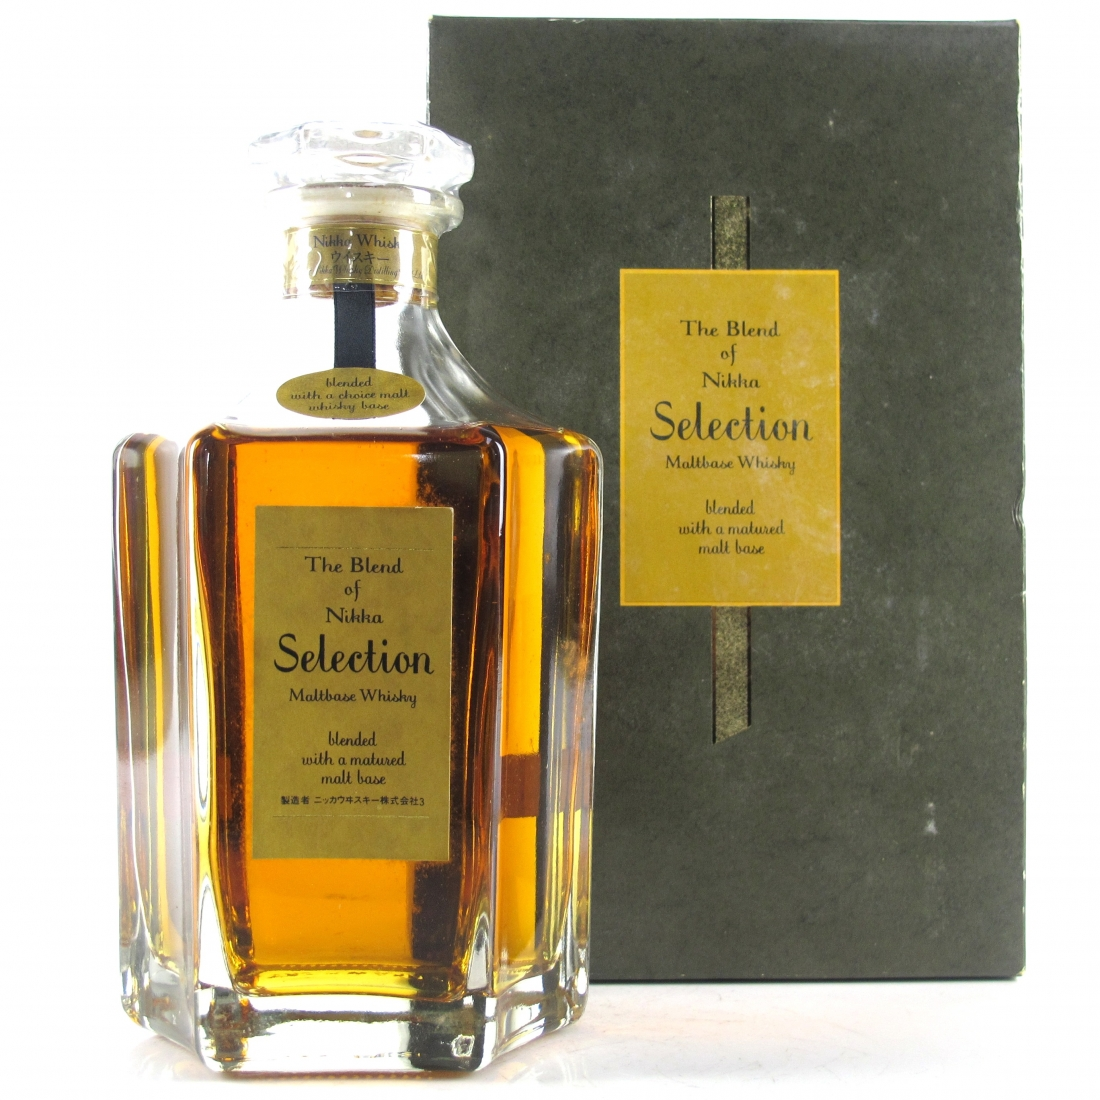 The Blend of Nikka Maltbase Whisky 66cl